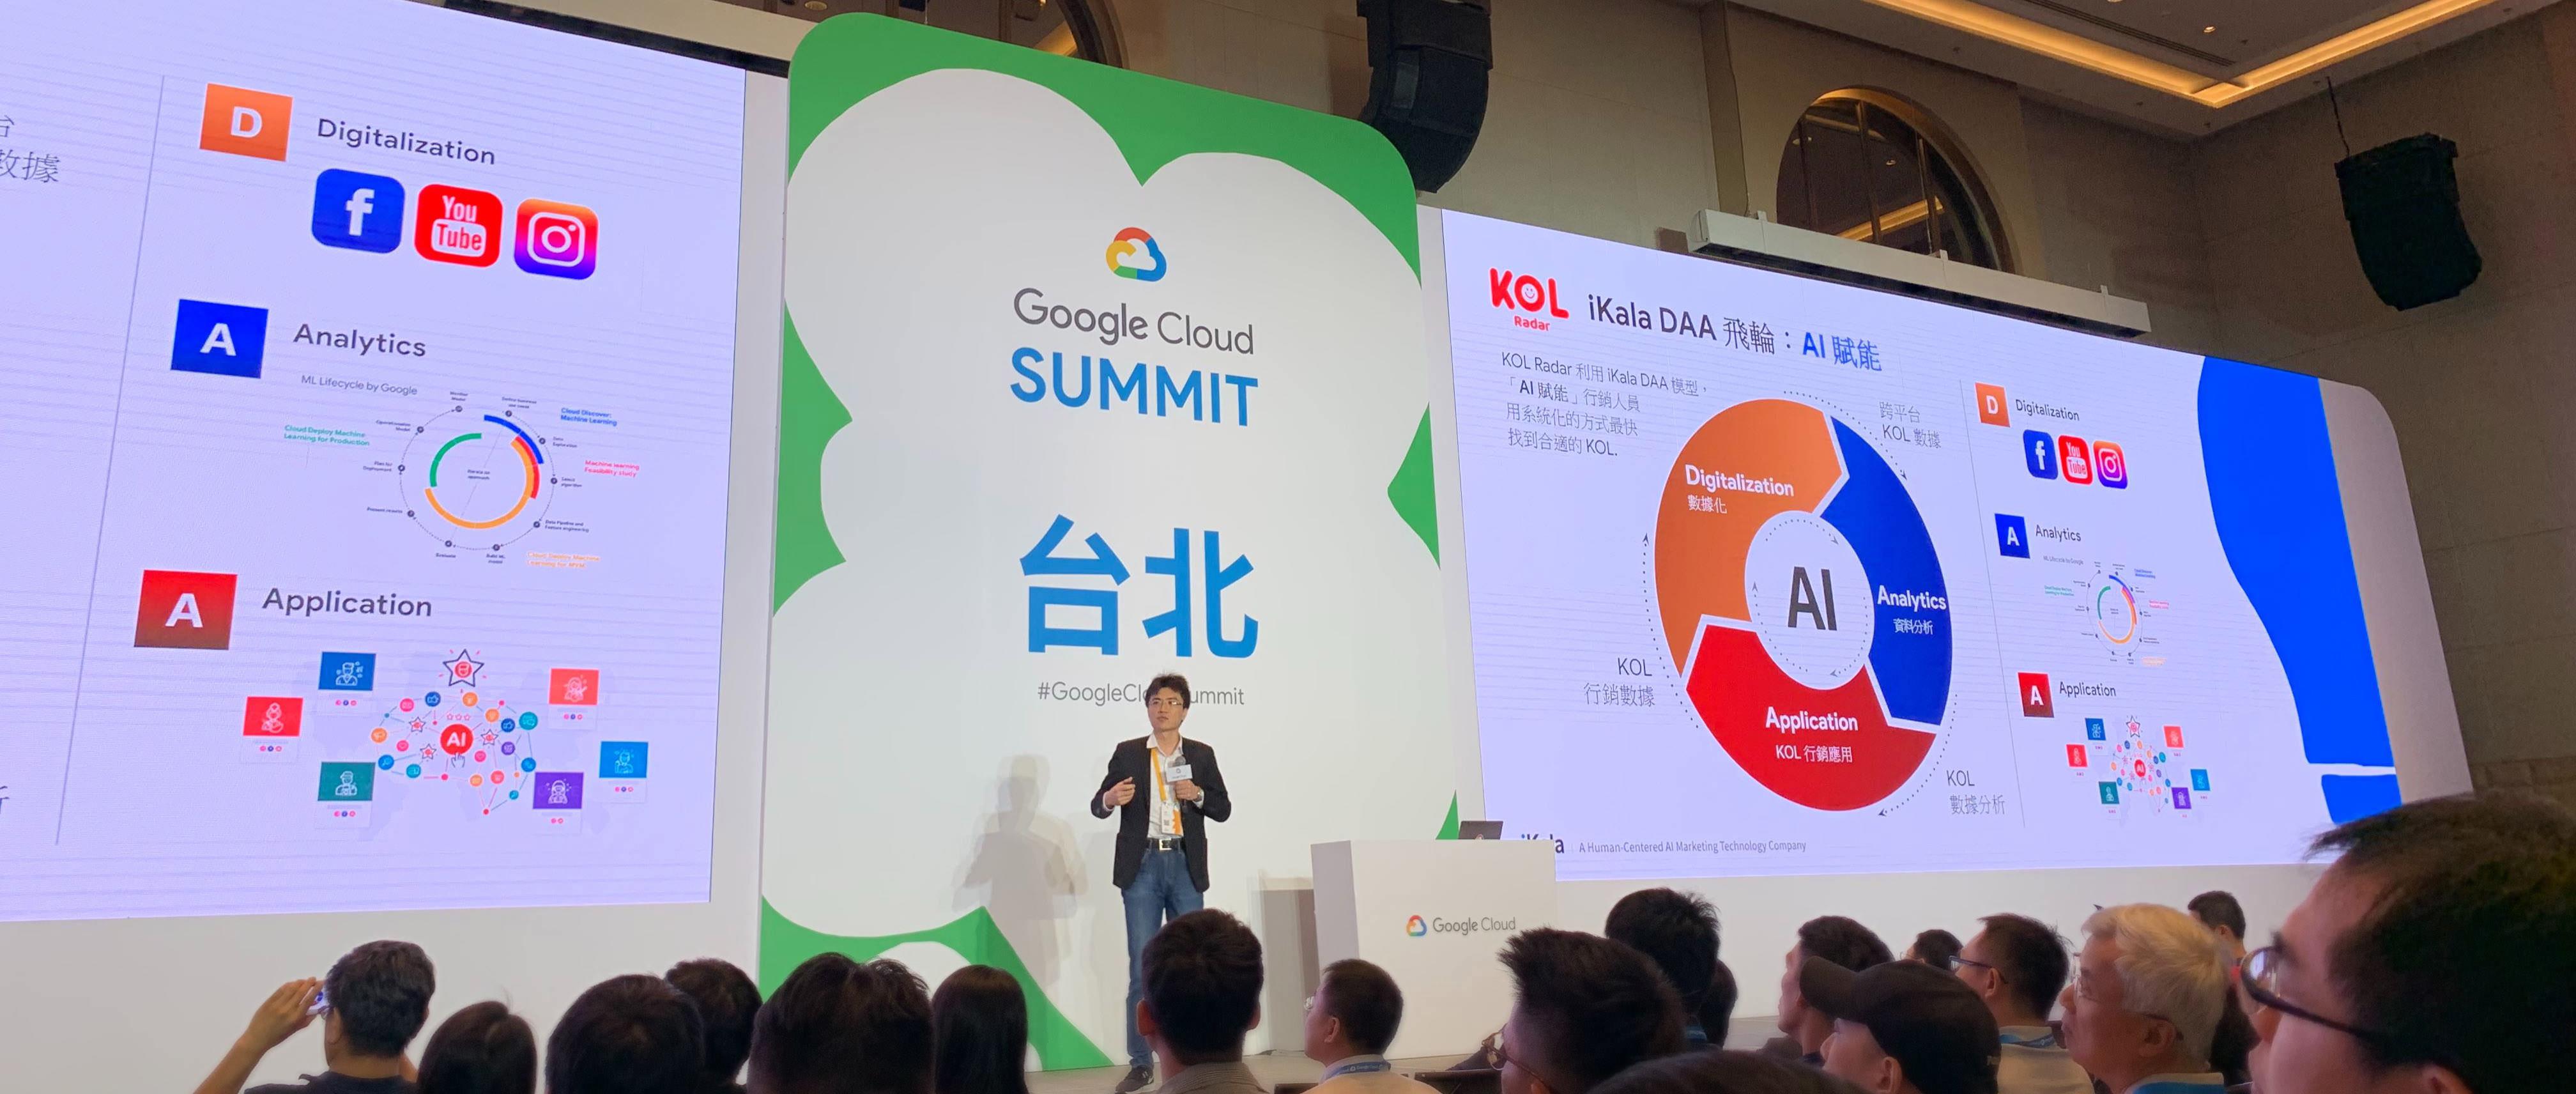 iKala 的共同創辦人暨營運長鄭鎧尹於 Google Cloud Summit 展示 AI 行銷趨勢